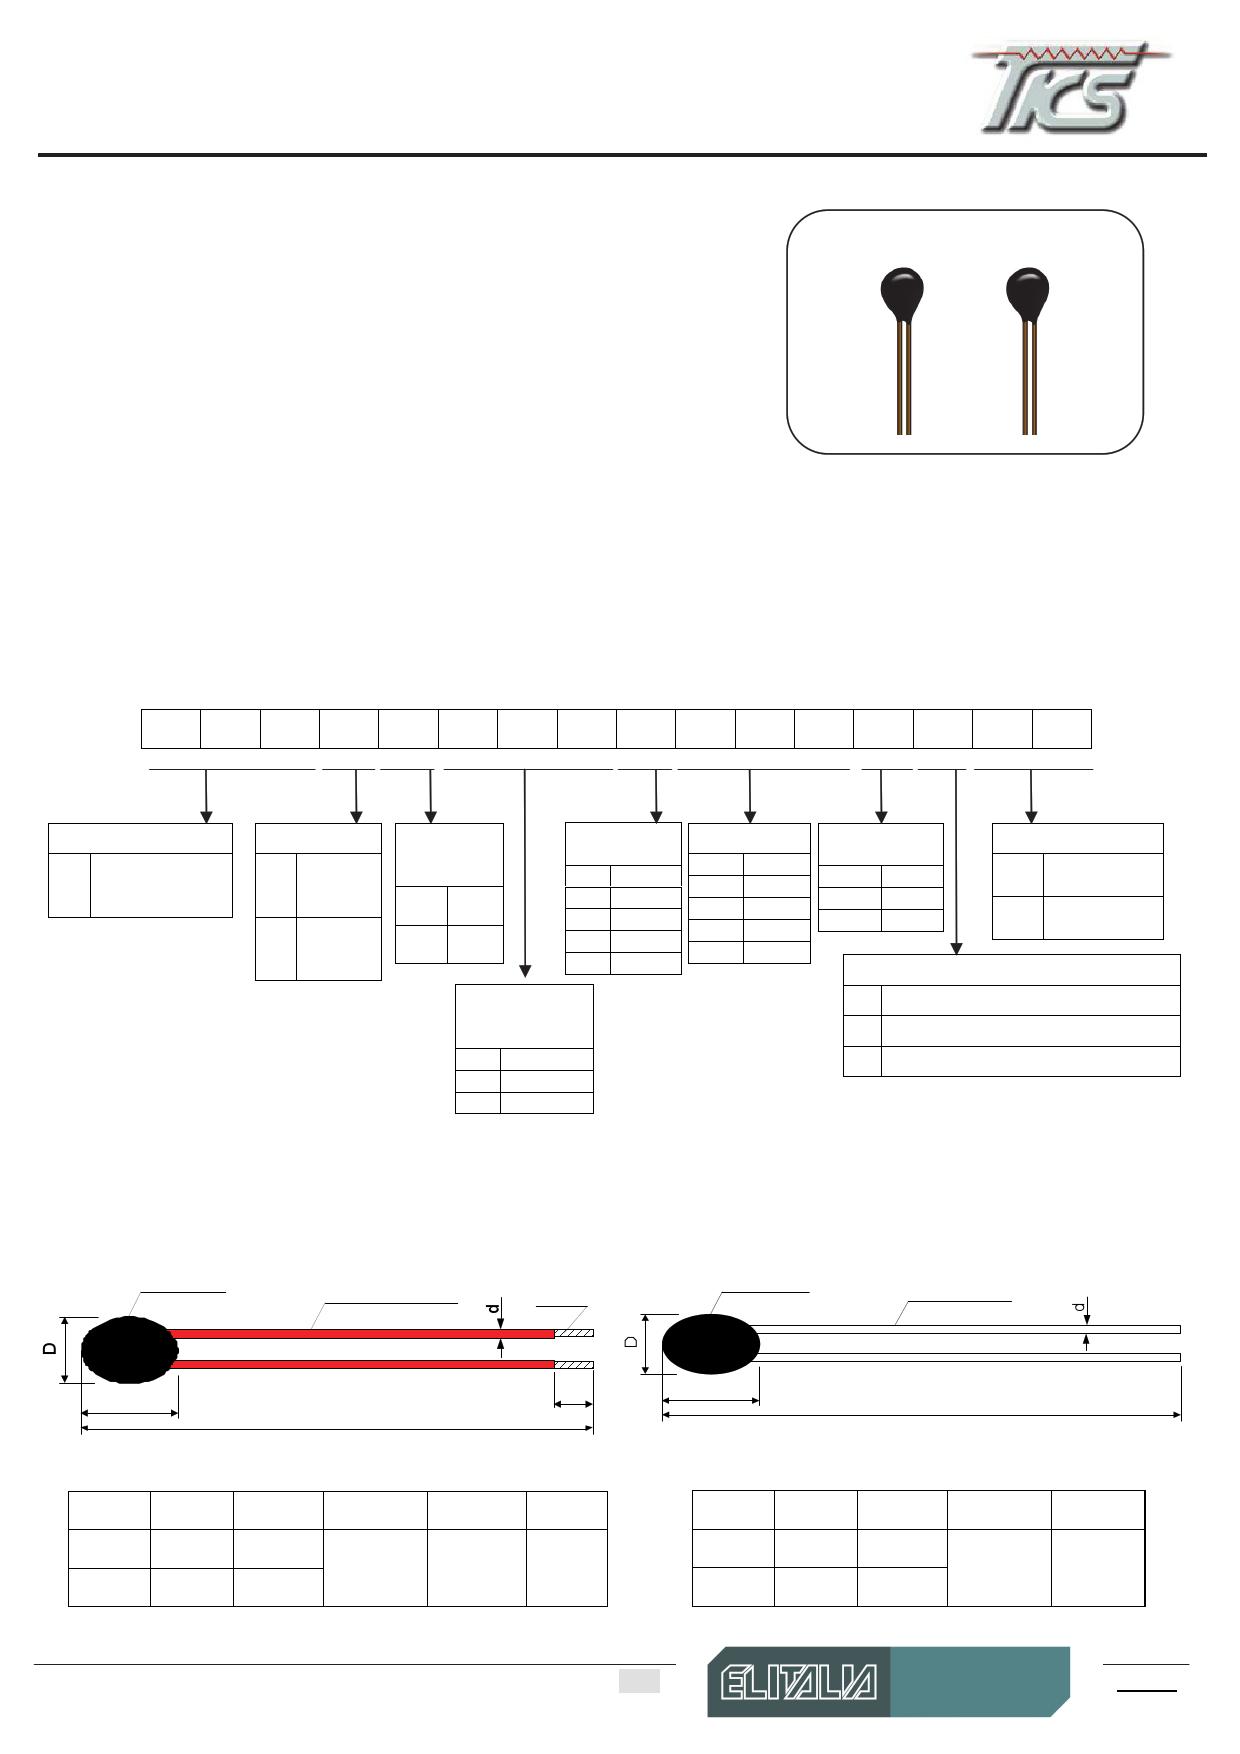 TTS2B102 datasheet, circuit